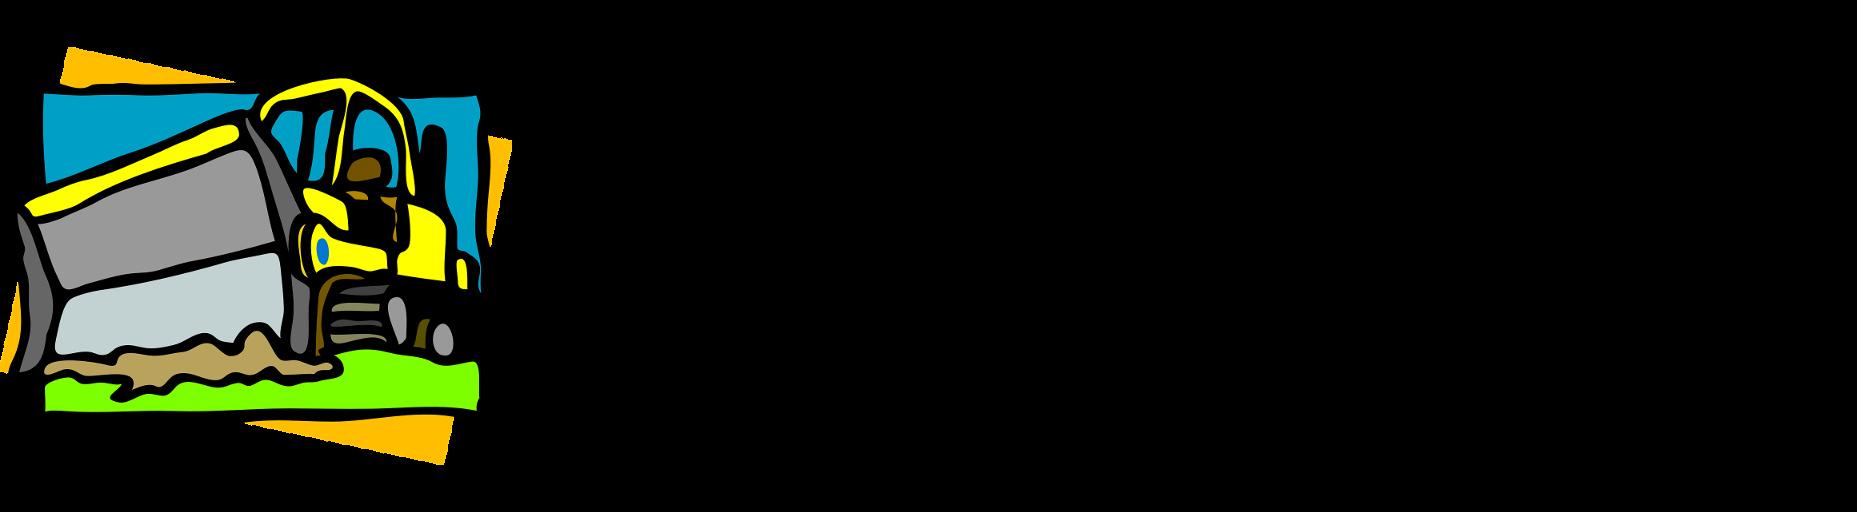 Krakster